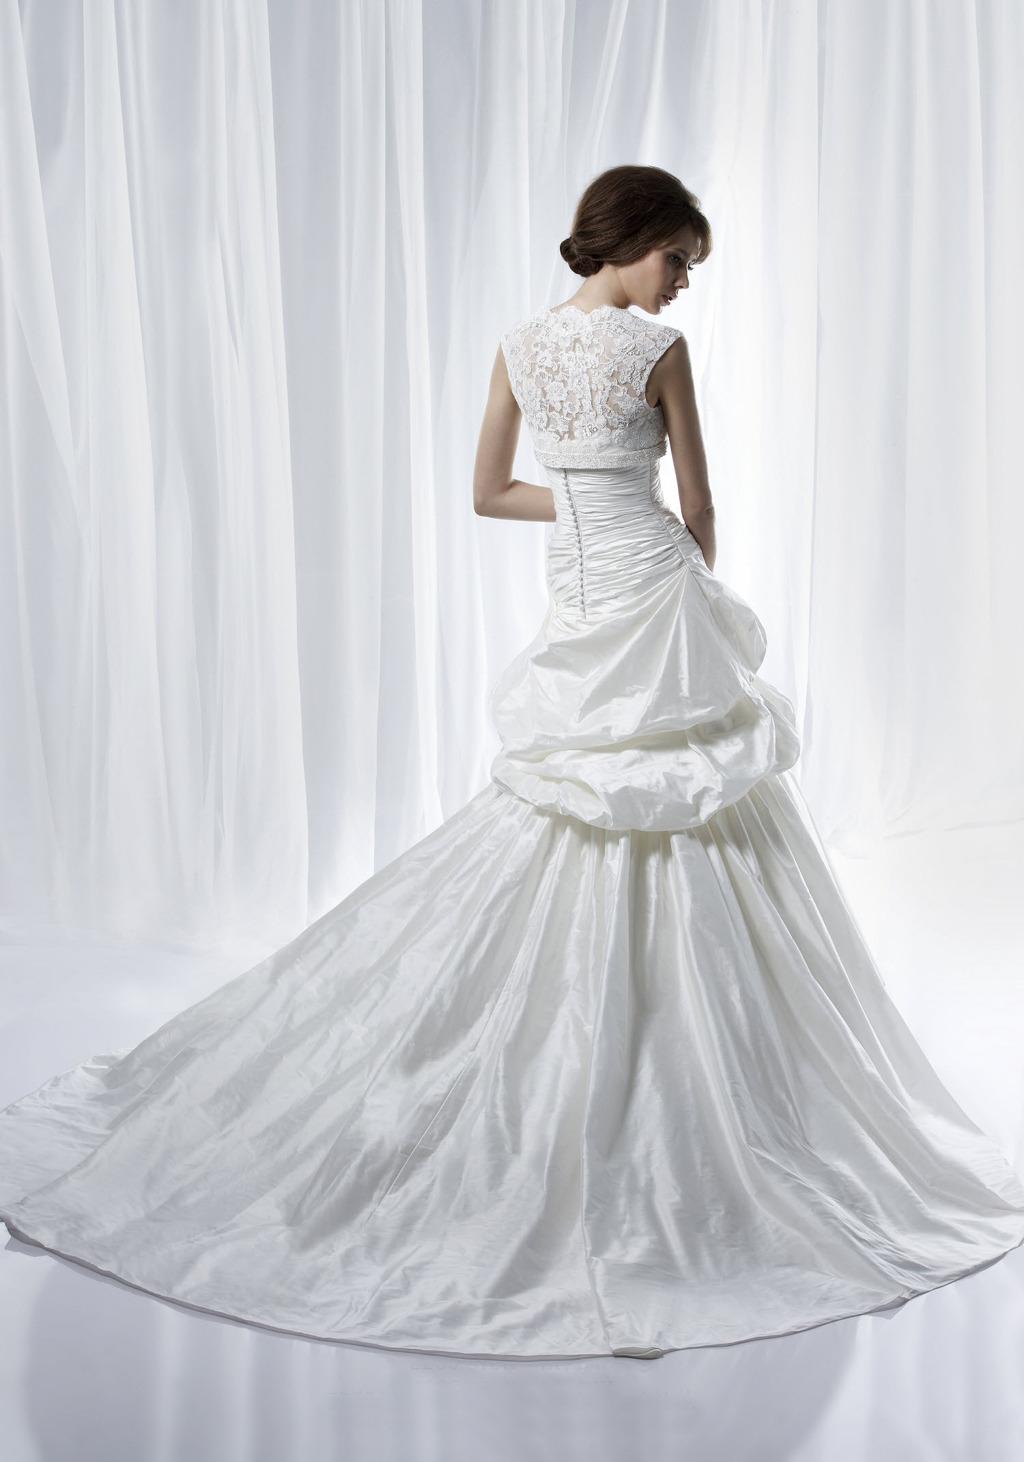 Romantic-wedding-dresses-2012-bridal-gown-lace-bolero-cap-sleeves-c112c.full